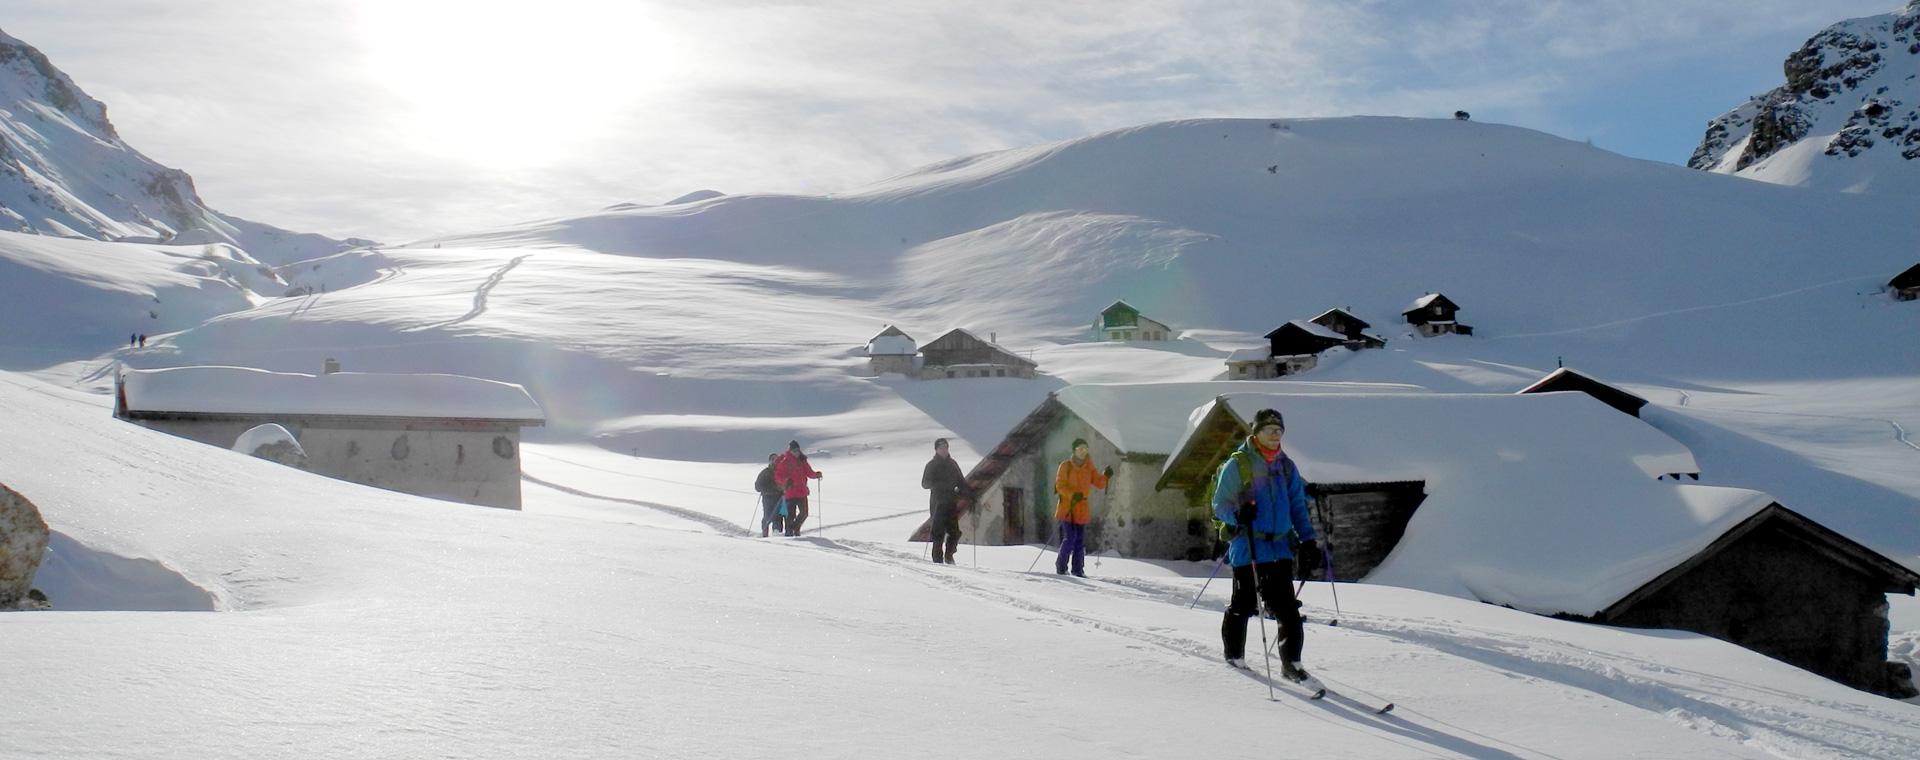 Voyage à la neige : Haute Ubaye secrète